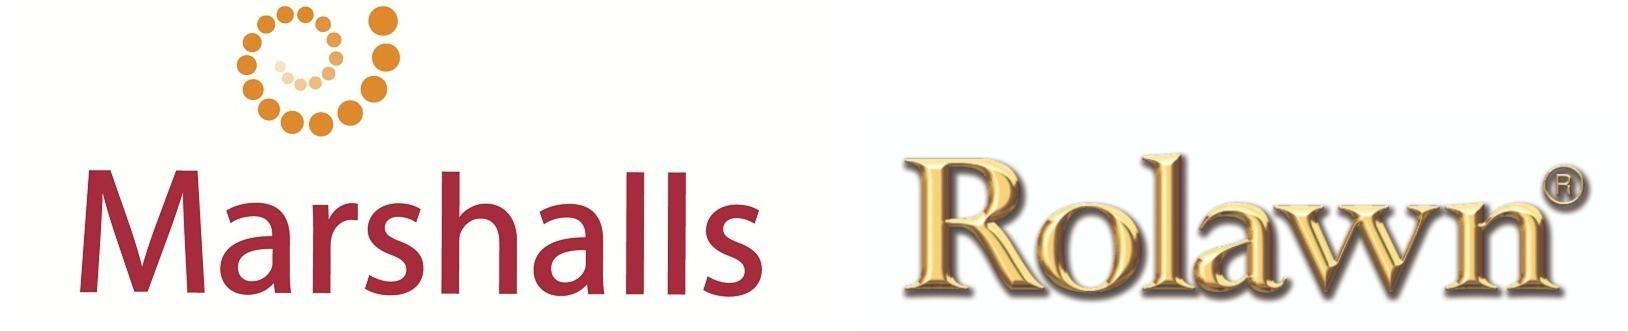 marshalls and rolawn logos